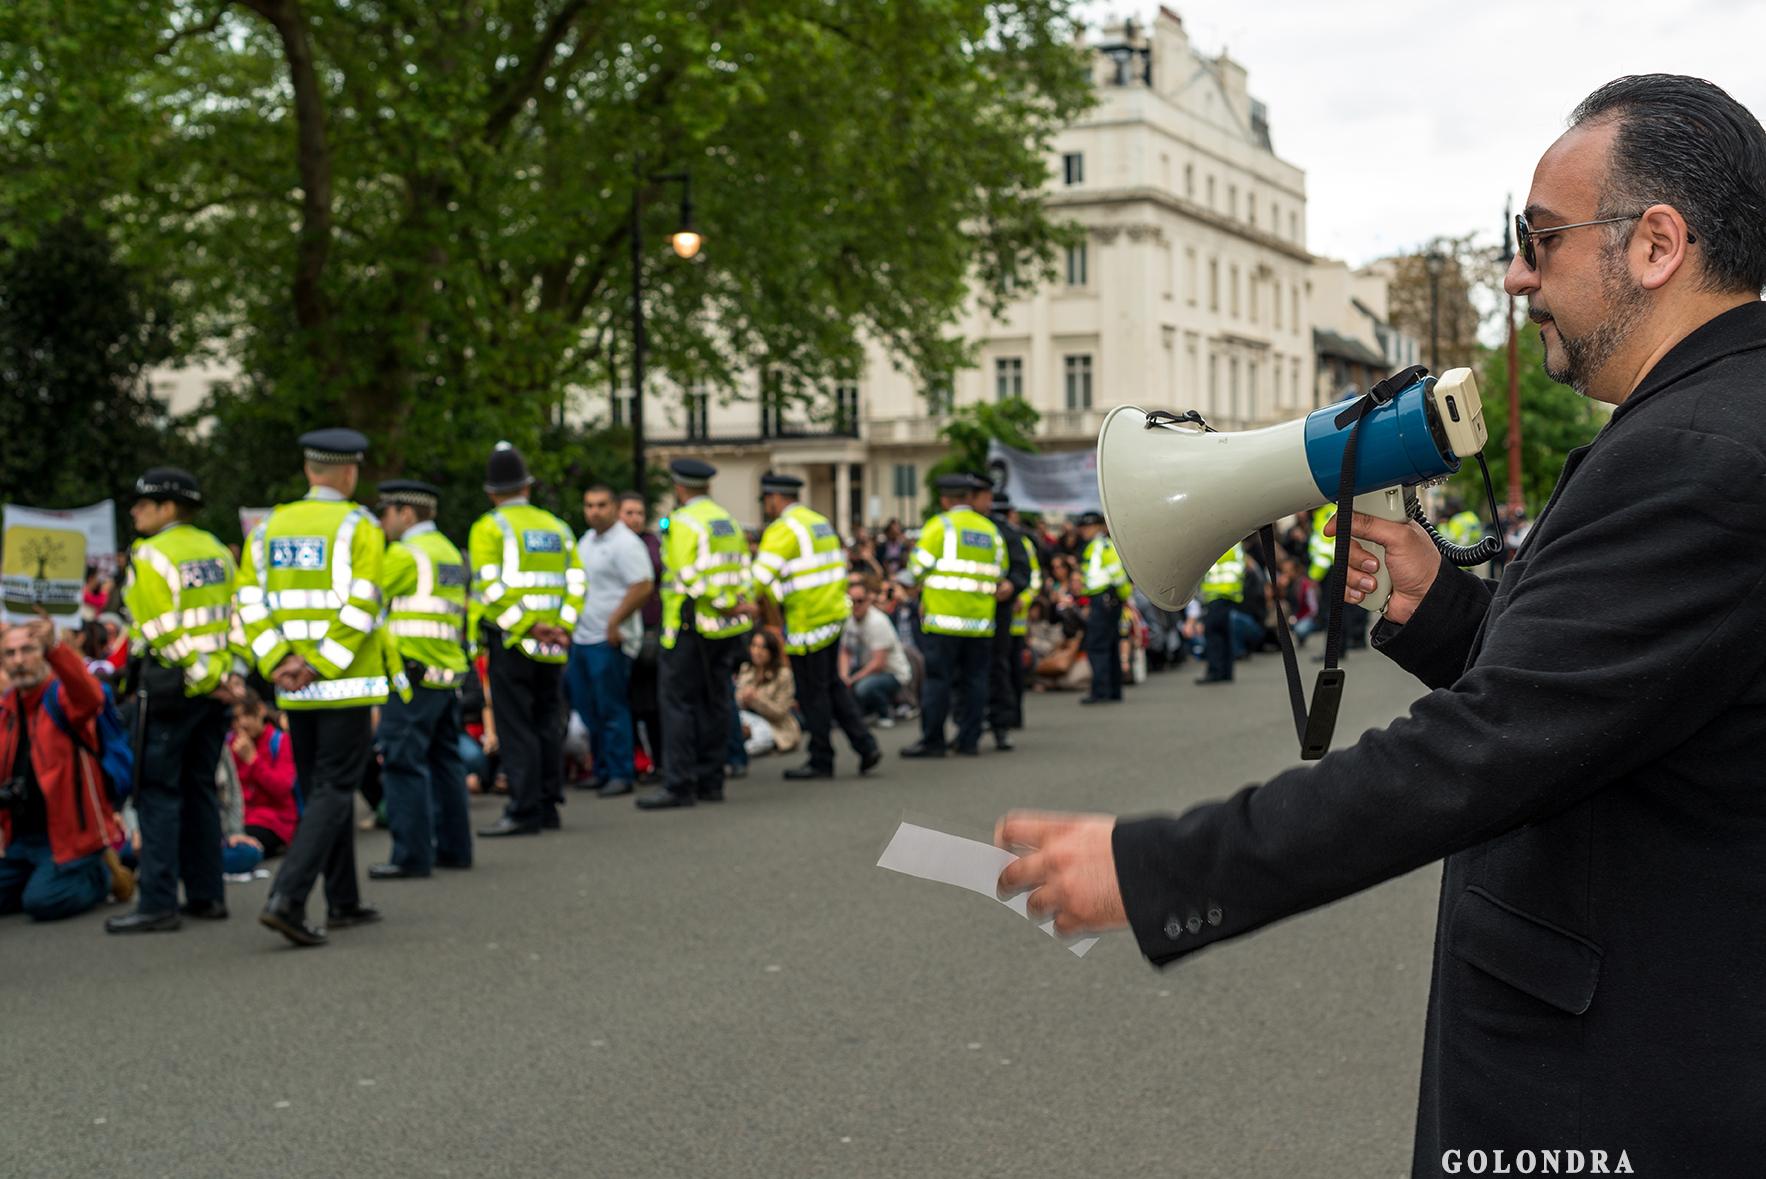 Protesting Turkish Government - Turk Hukumetini Protesto - Londra - London (45)